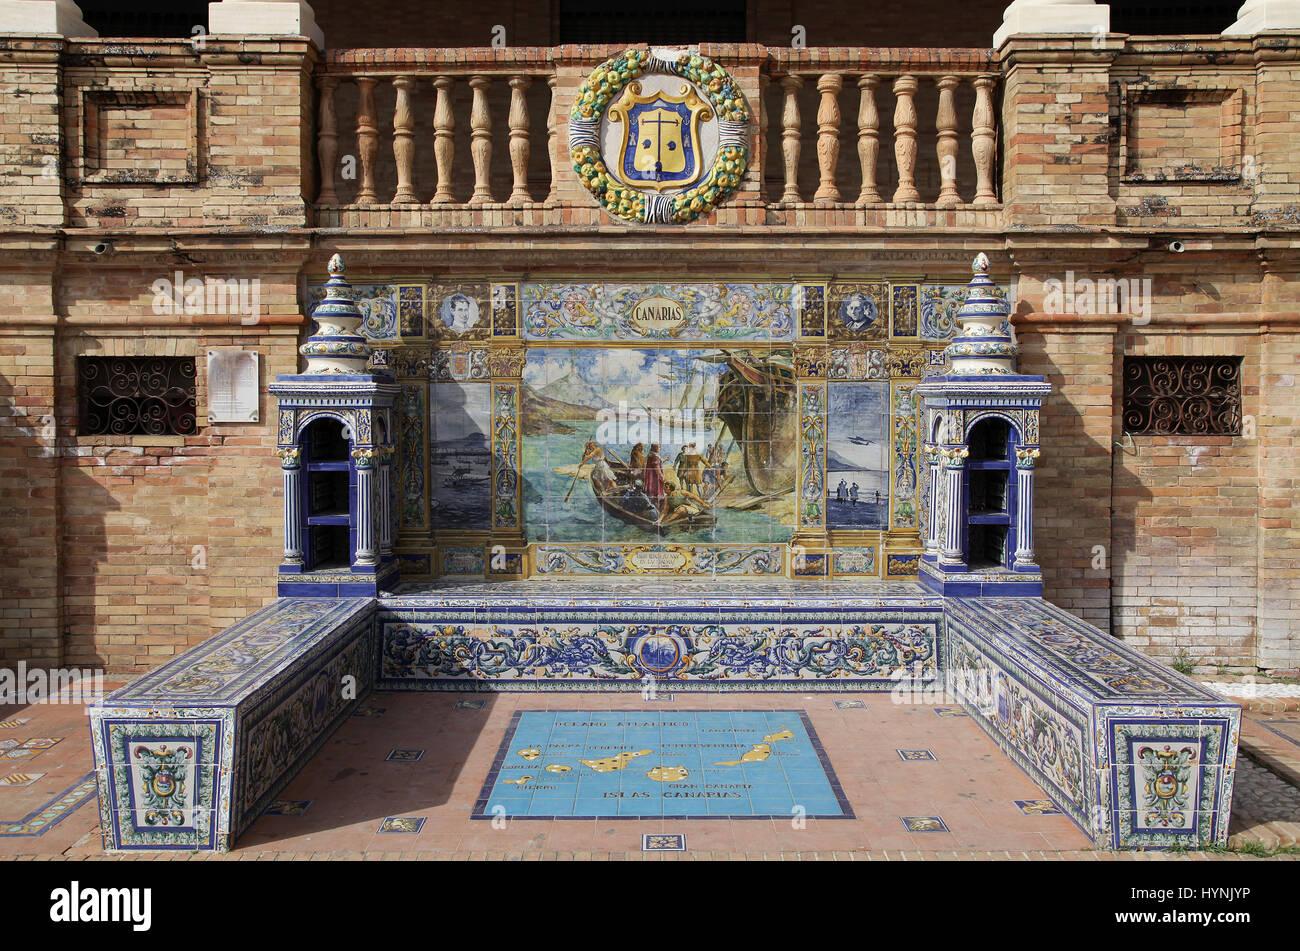 Ceramic Azulejos tiled provincial Bench or Alcove of Canarias  on the Plaza de España in Parque de Maria Luisa - Stock Image